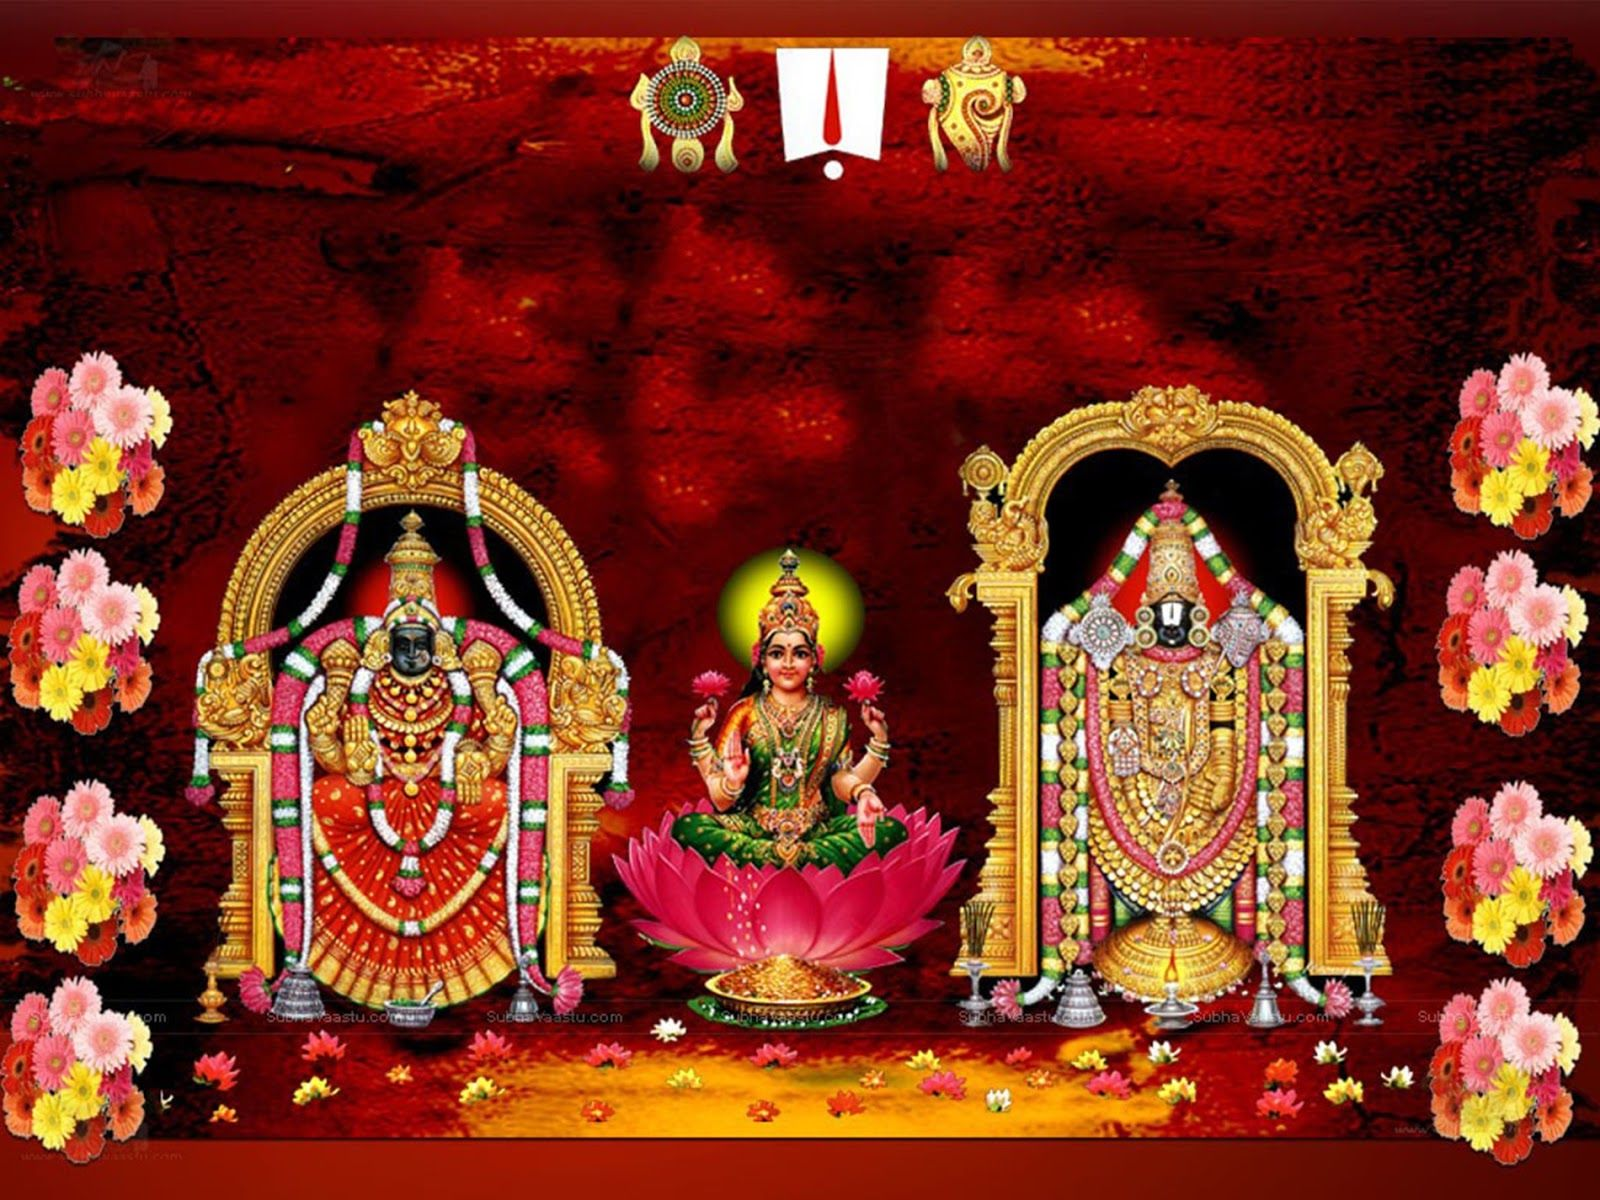 lord venkateswara hd wallpapers for windows 7 images 44 hd tour packages lord balaji lord vishnu wallpapers lord venkateswara hd wallpapers for